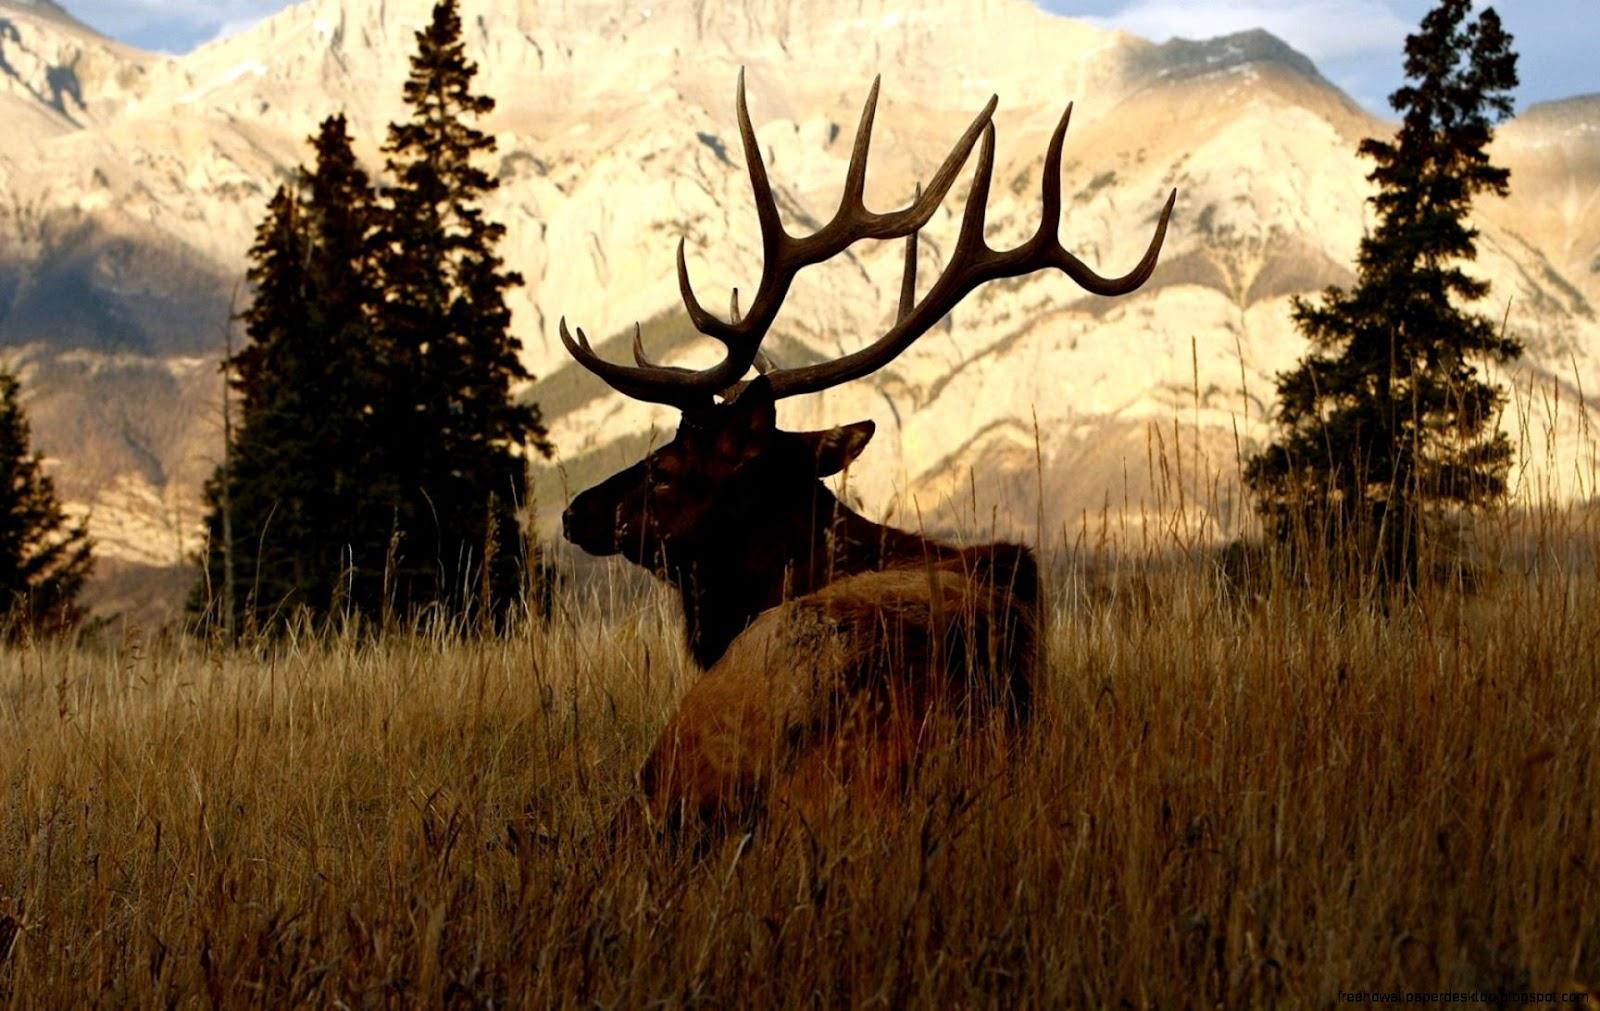 Deer Animals Nature Hd Wallpaper | Free High Definition Wallpapers